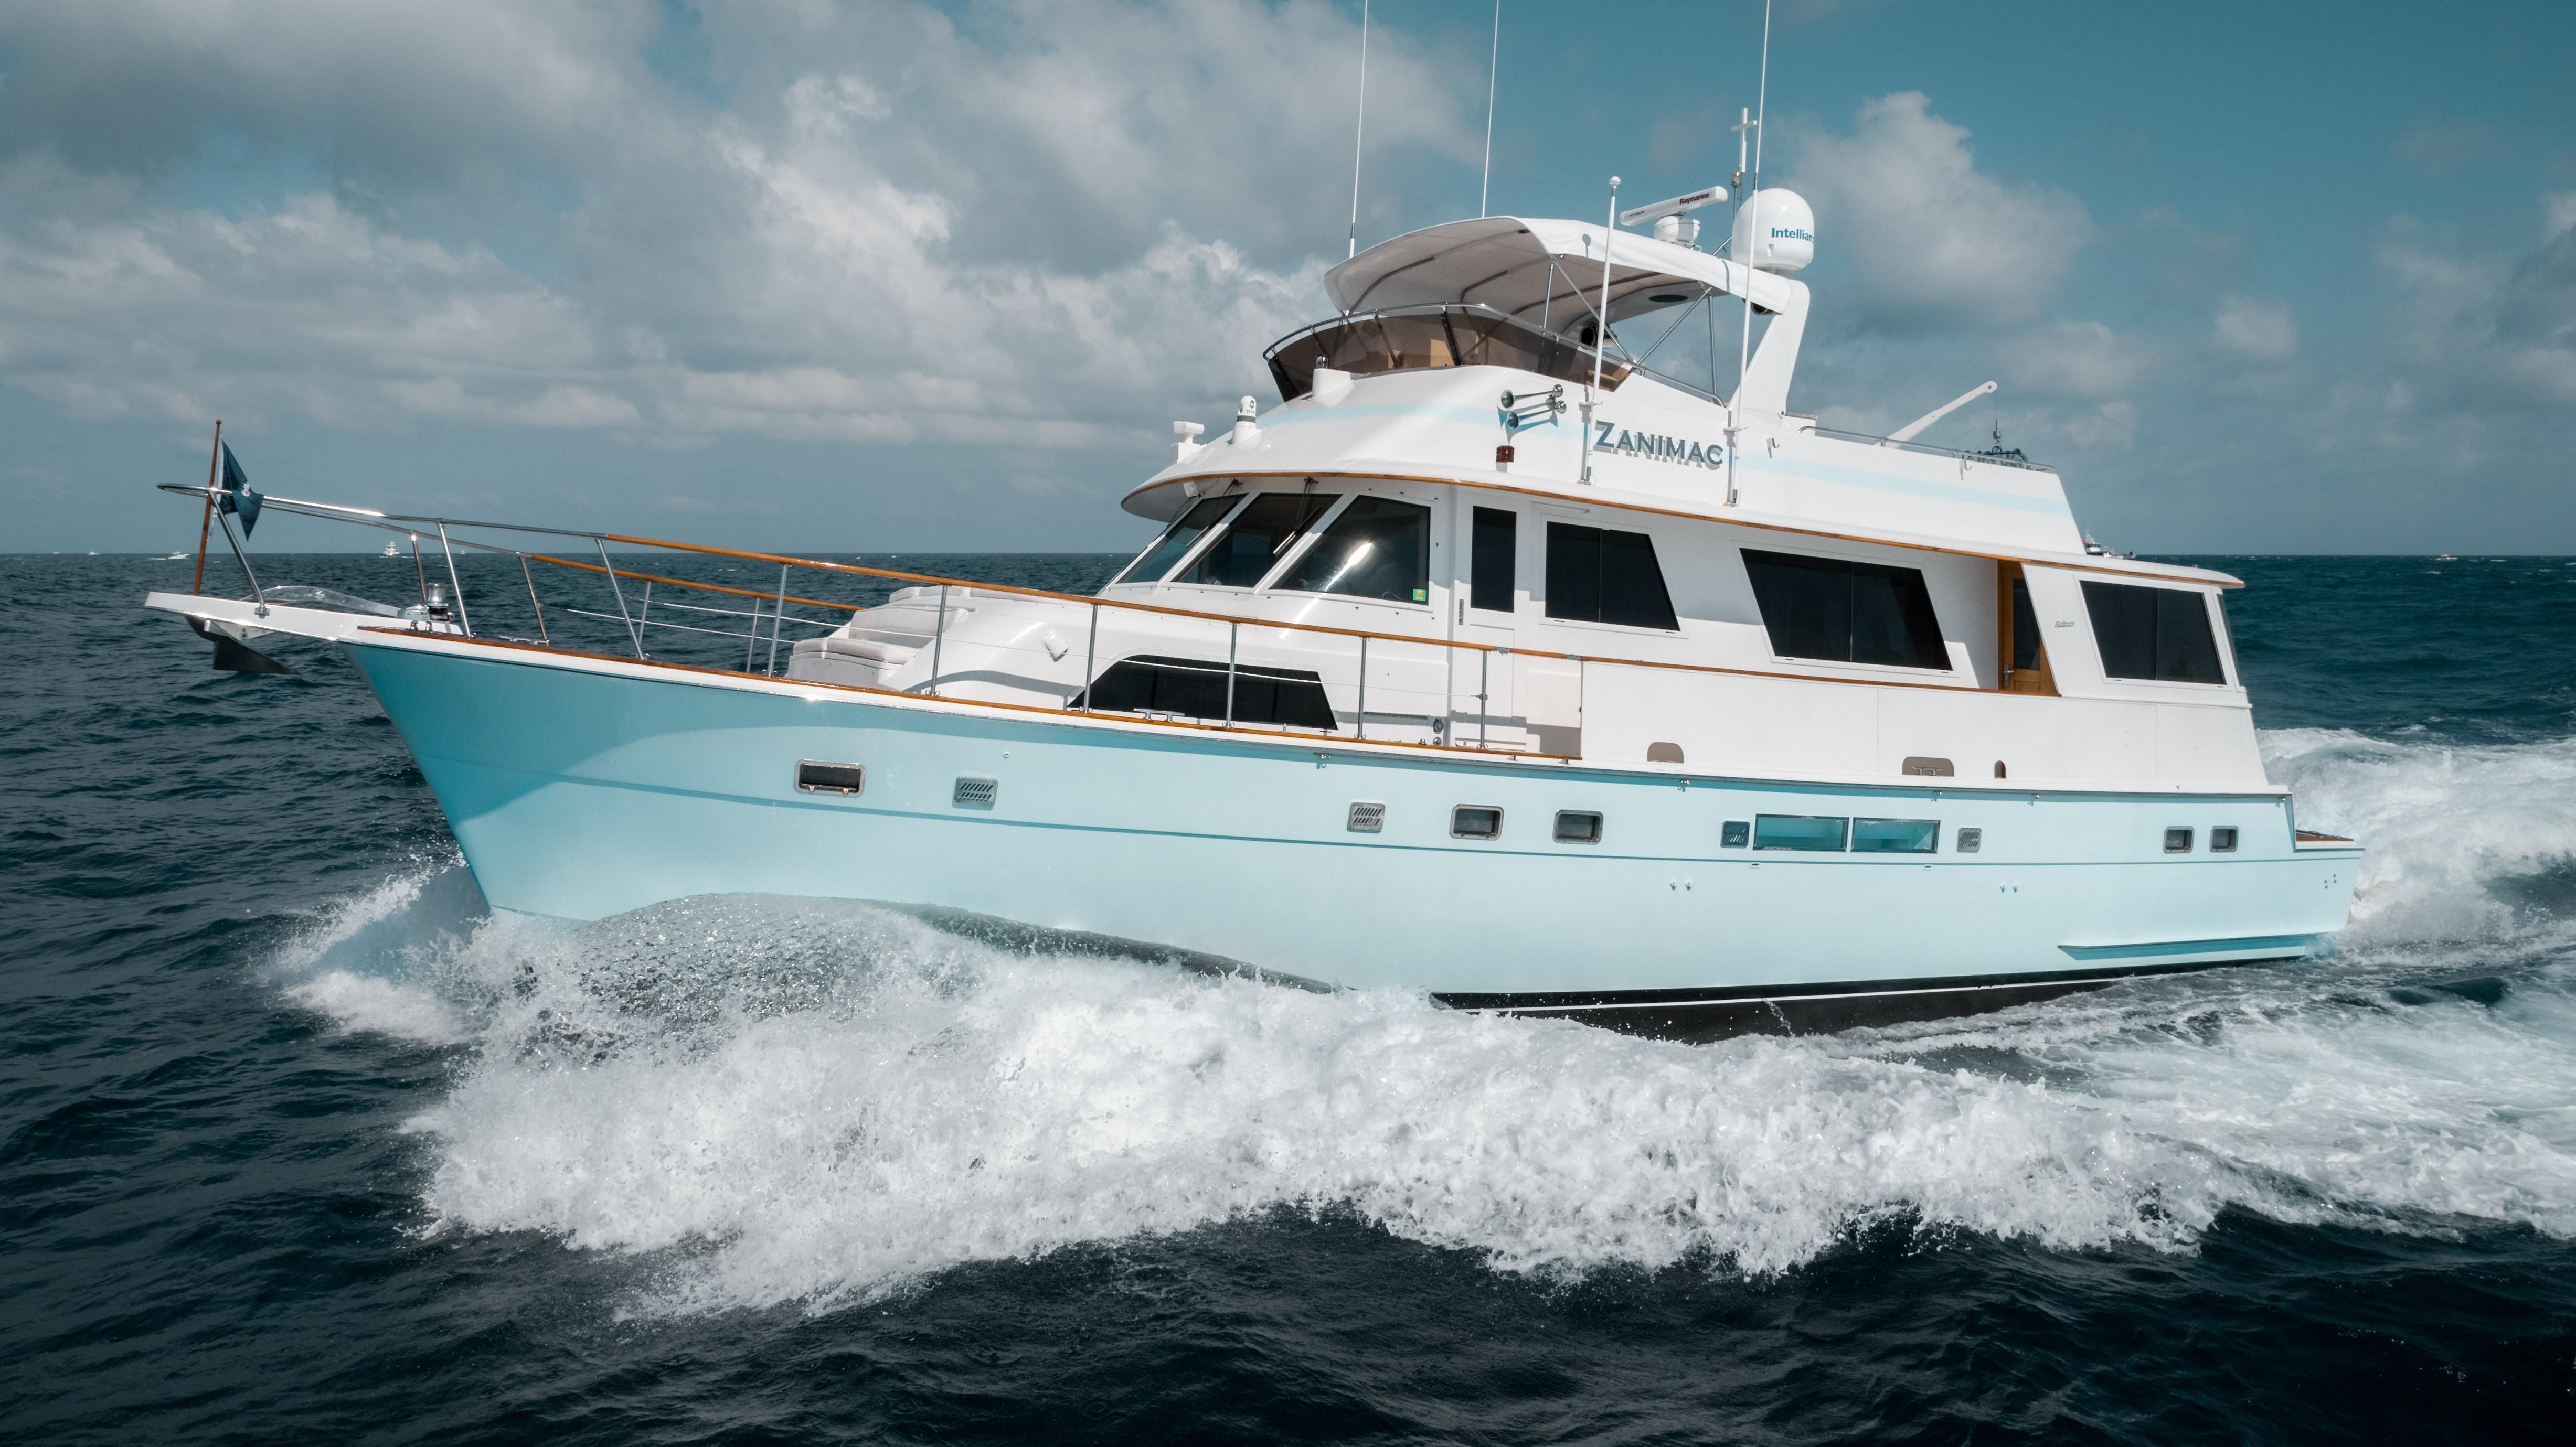 63 Hatteras Zanimac 1987 Fort Lauderdale   Denison Yacht